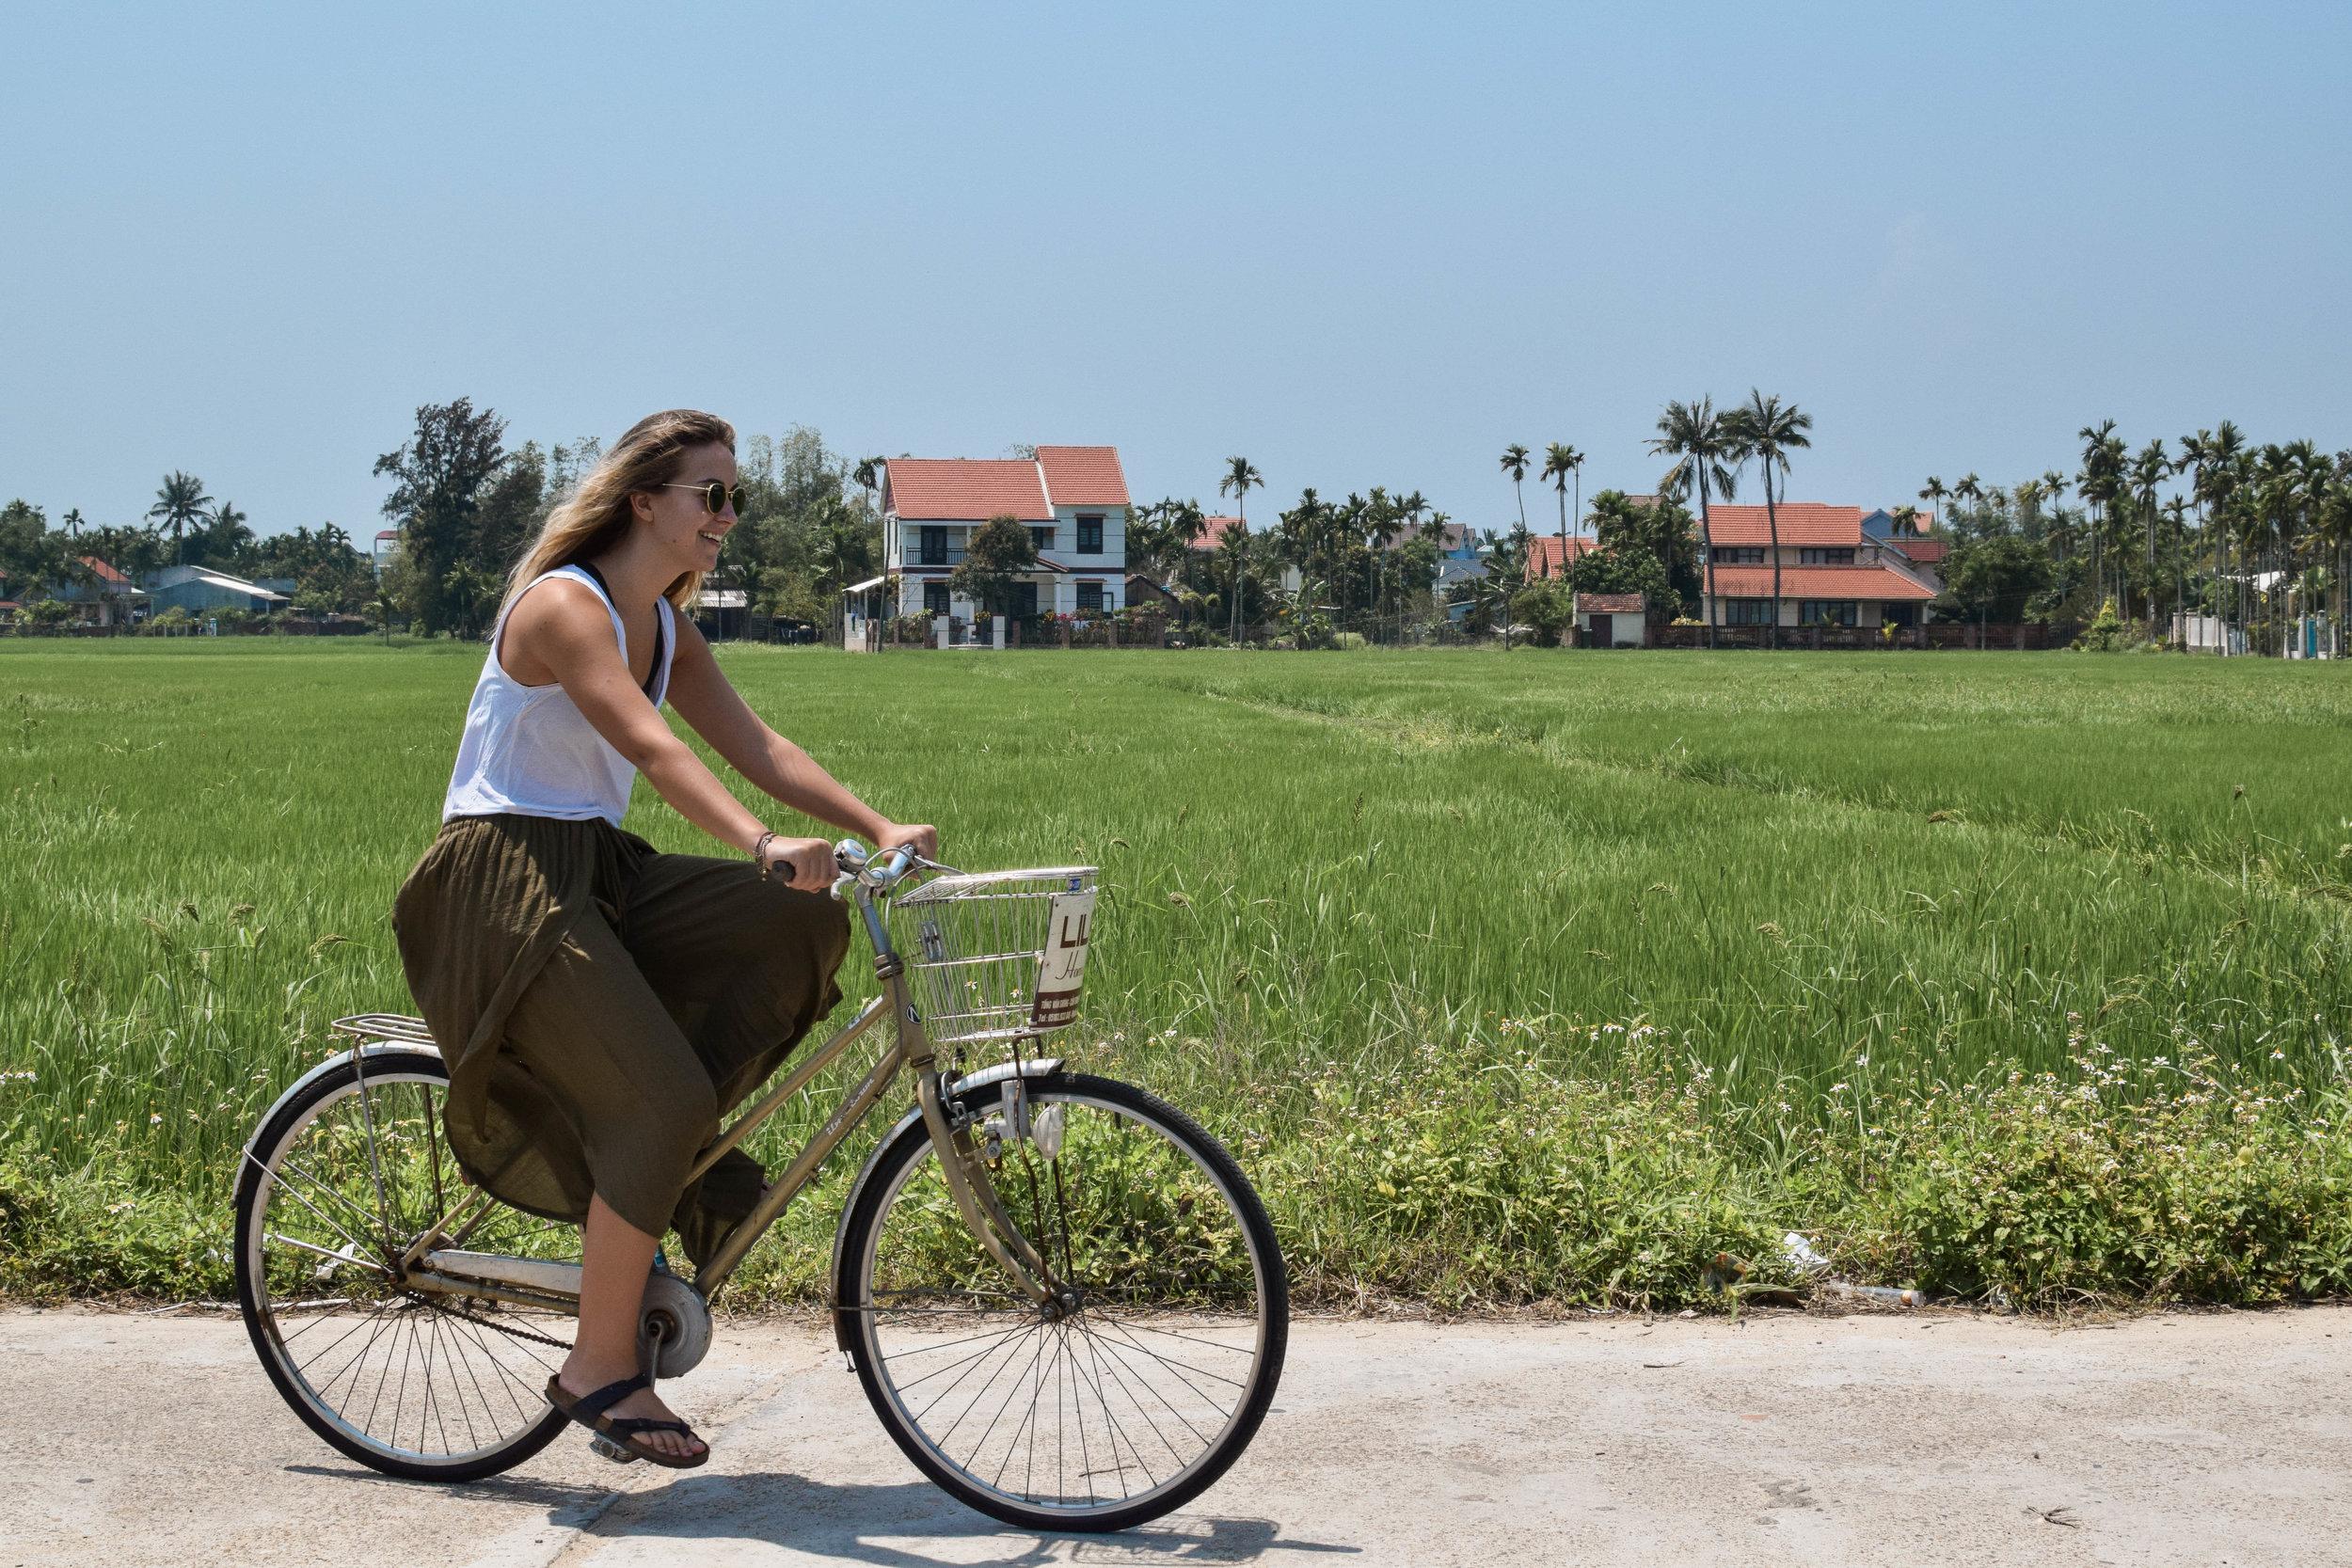 Look guys, I'm riding a bike!